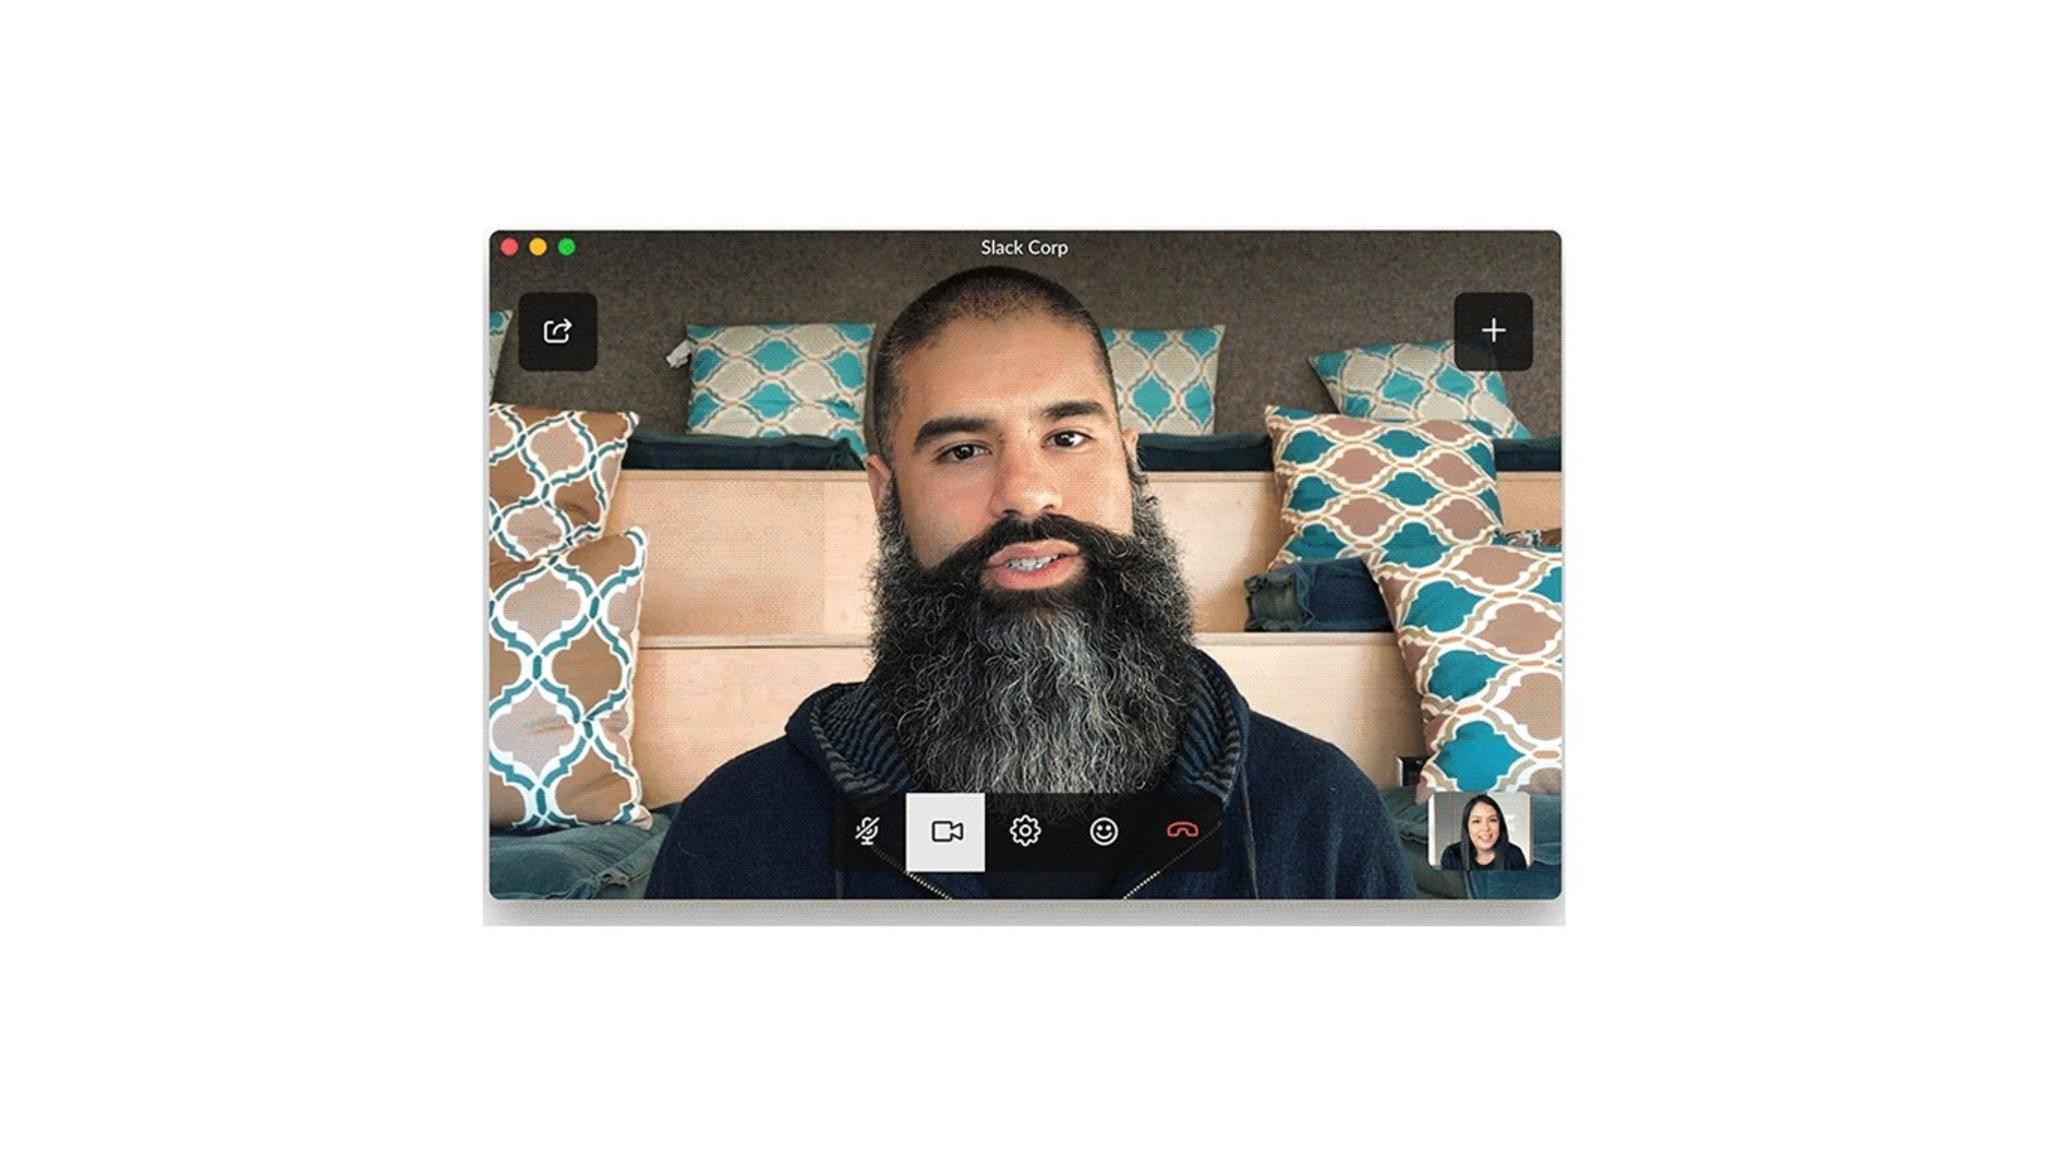 Das Business-Chat-Tool Slack bietet jetzt Videoanrufe.